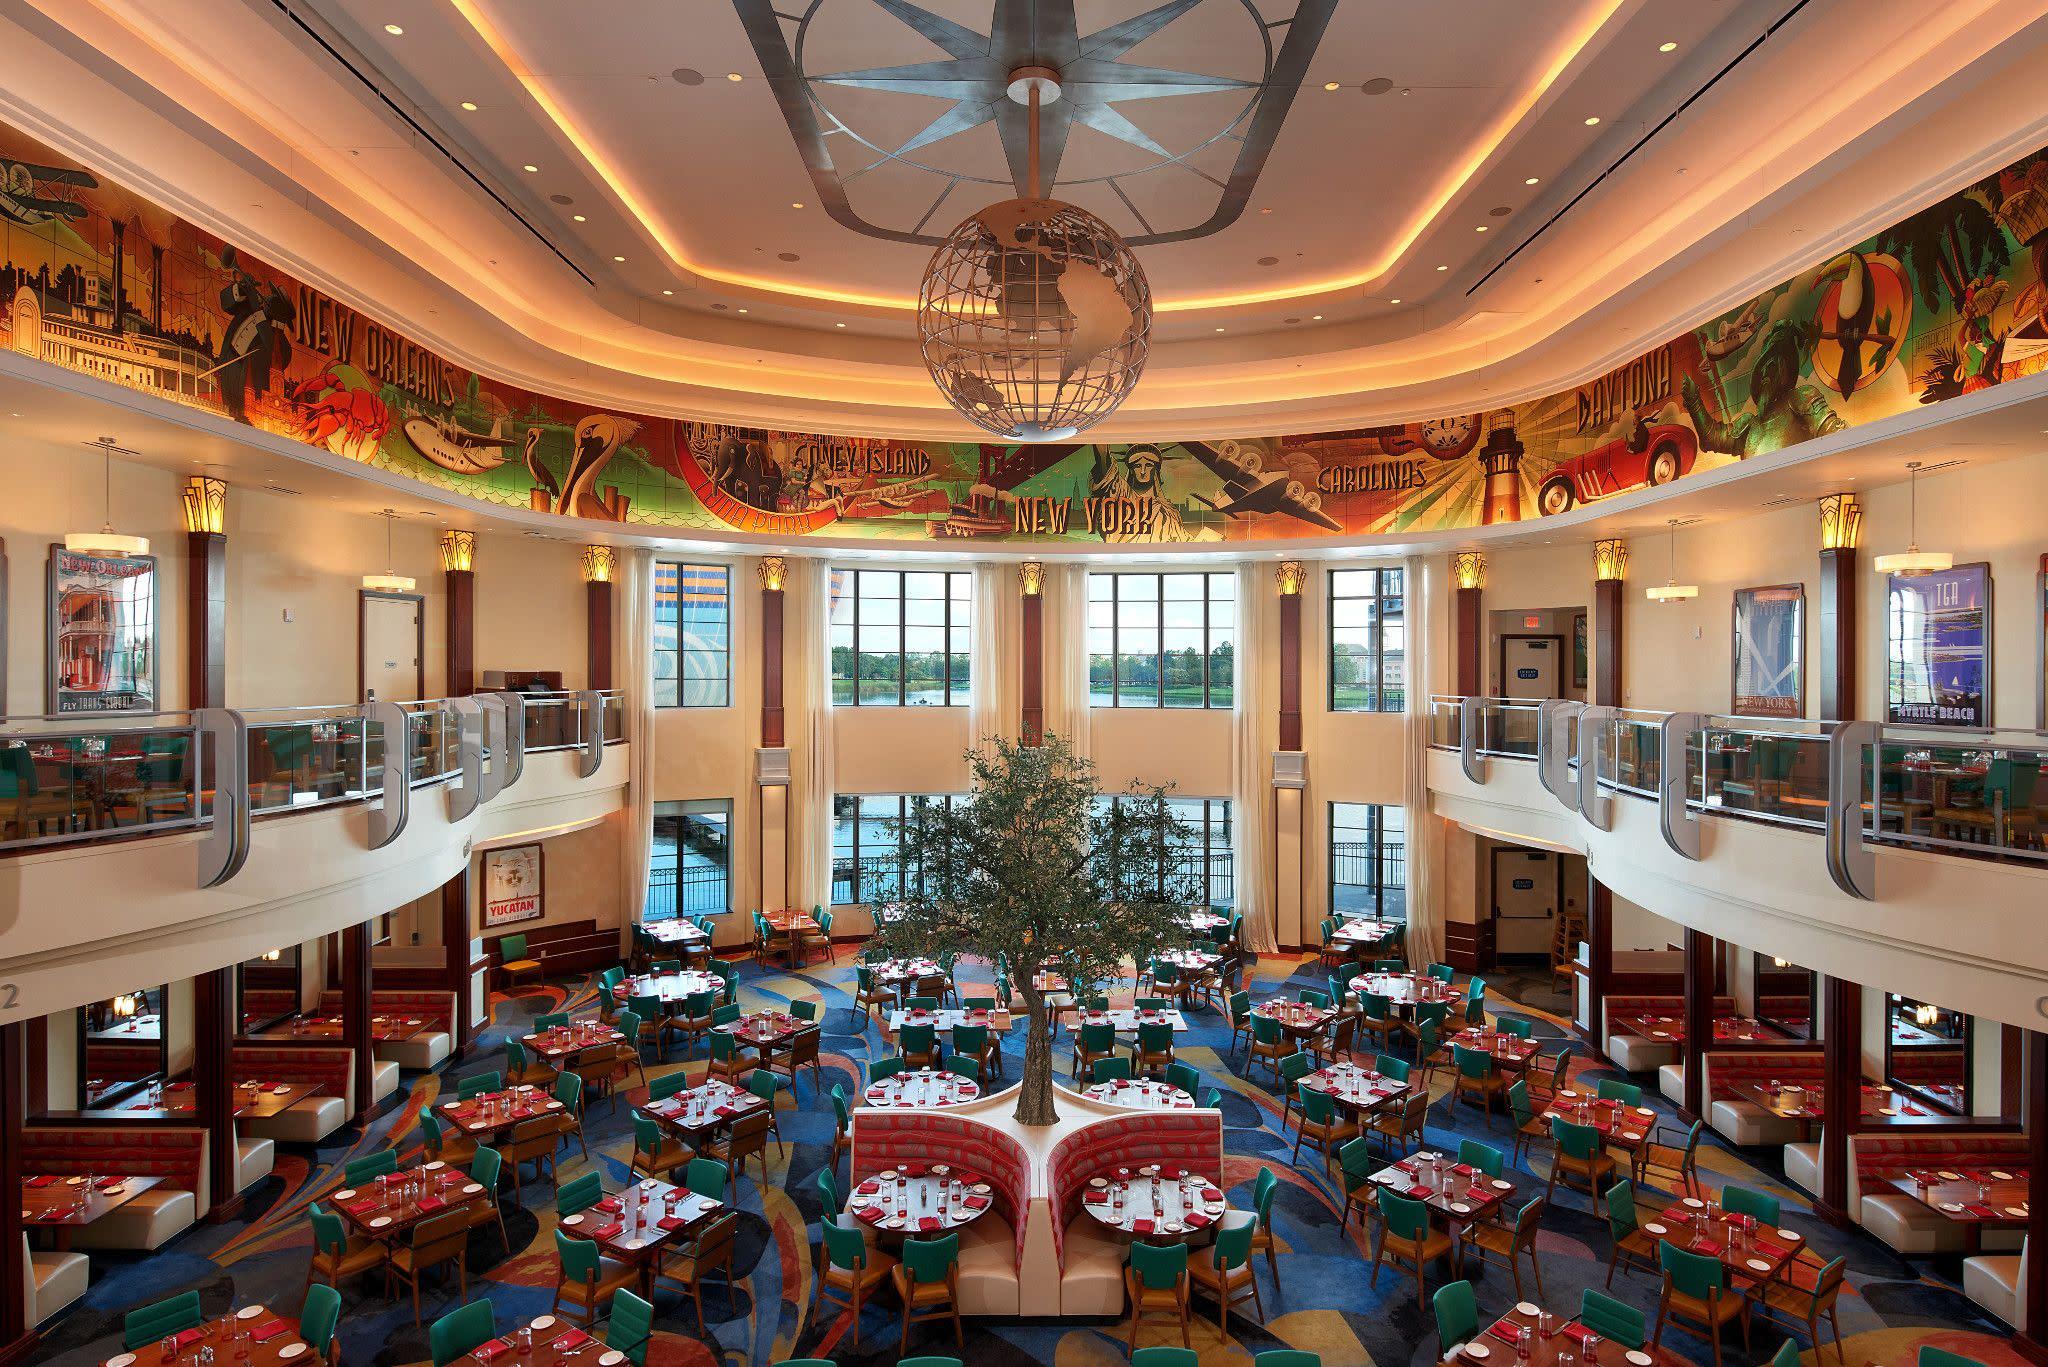 Maria & Enzo's Ristorante at Disney Springs in Orlando